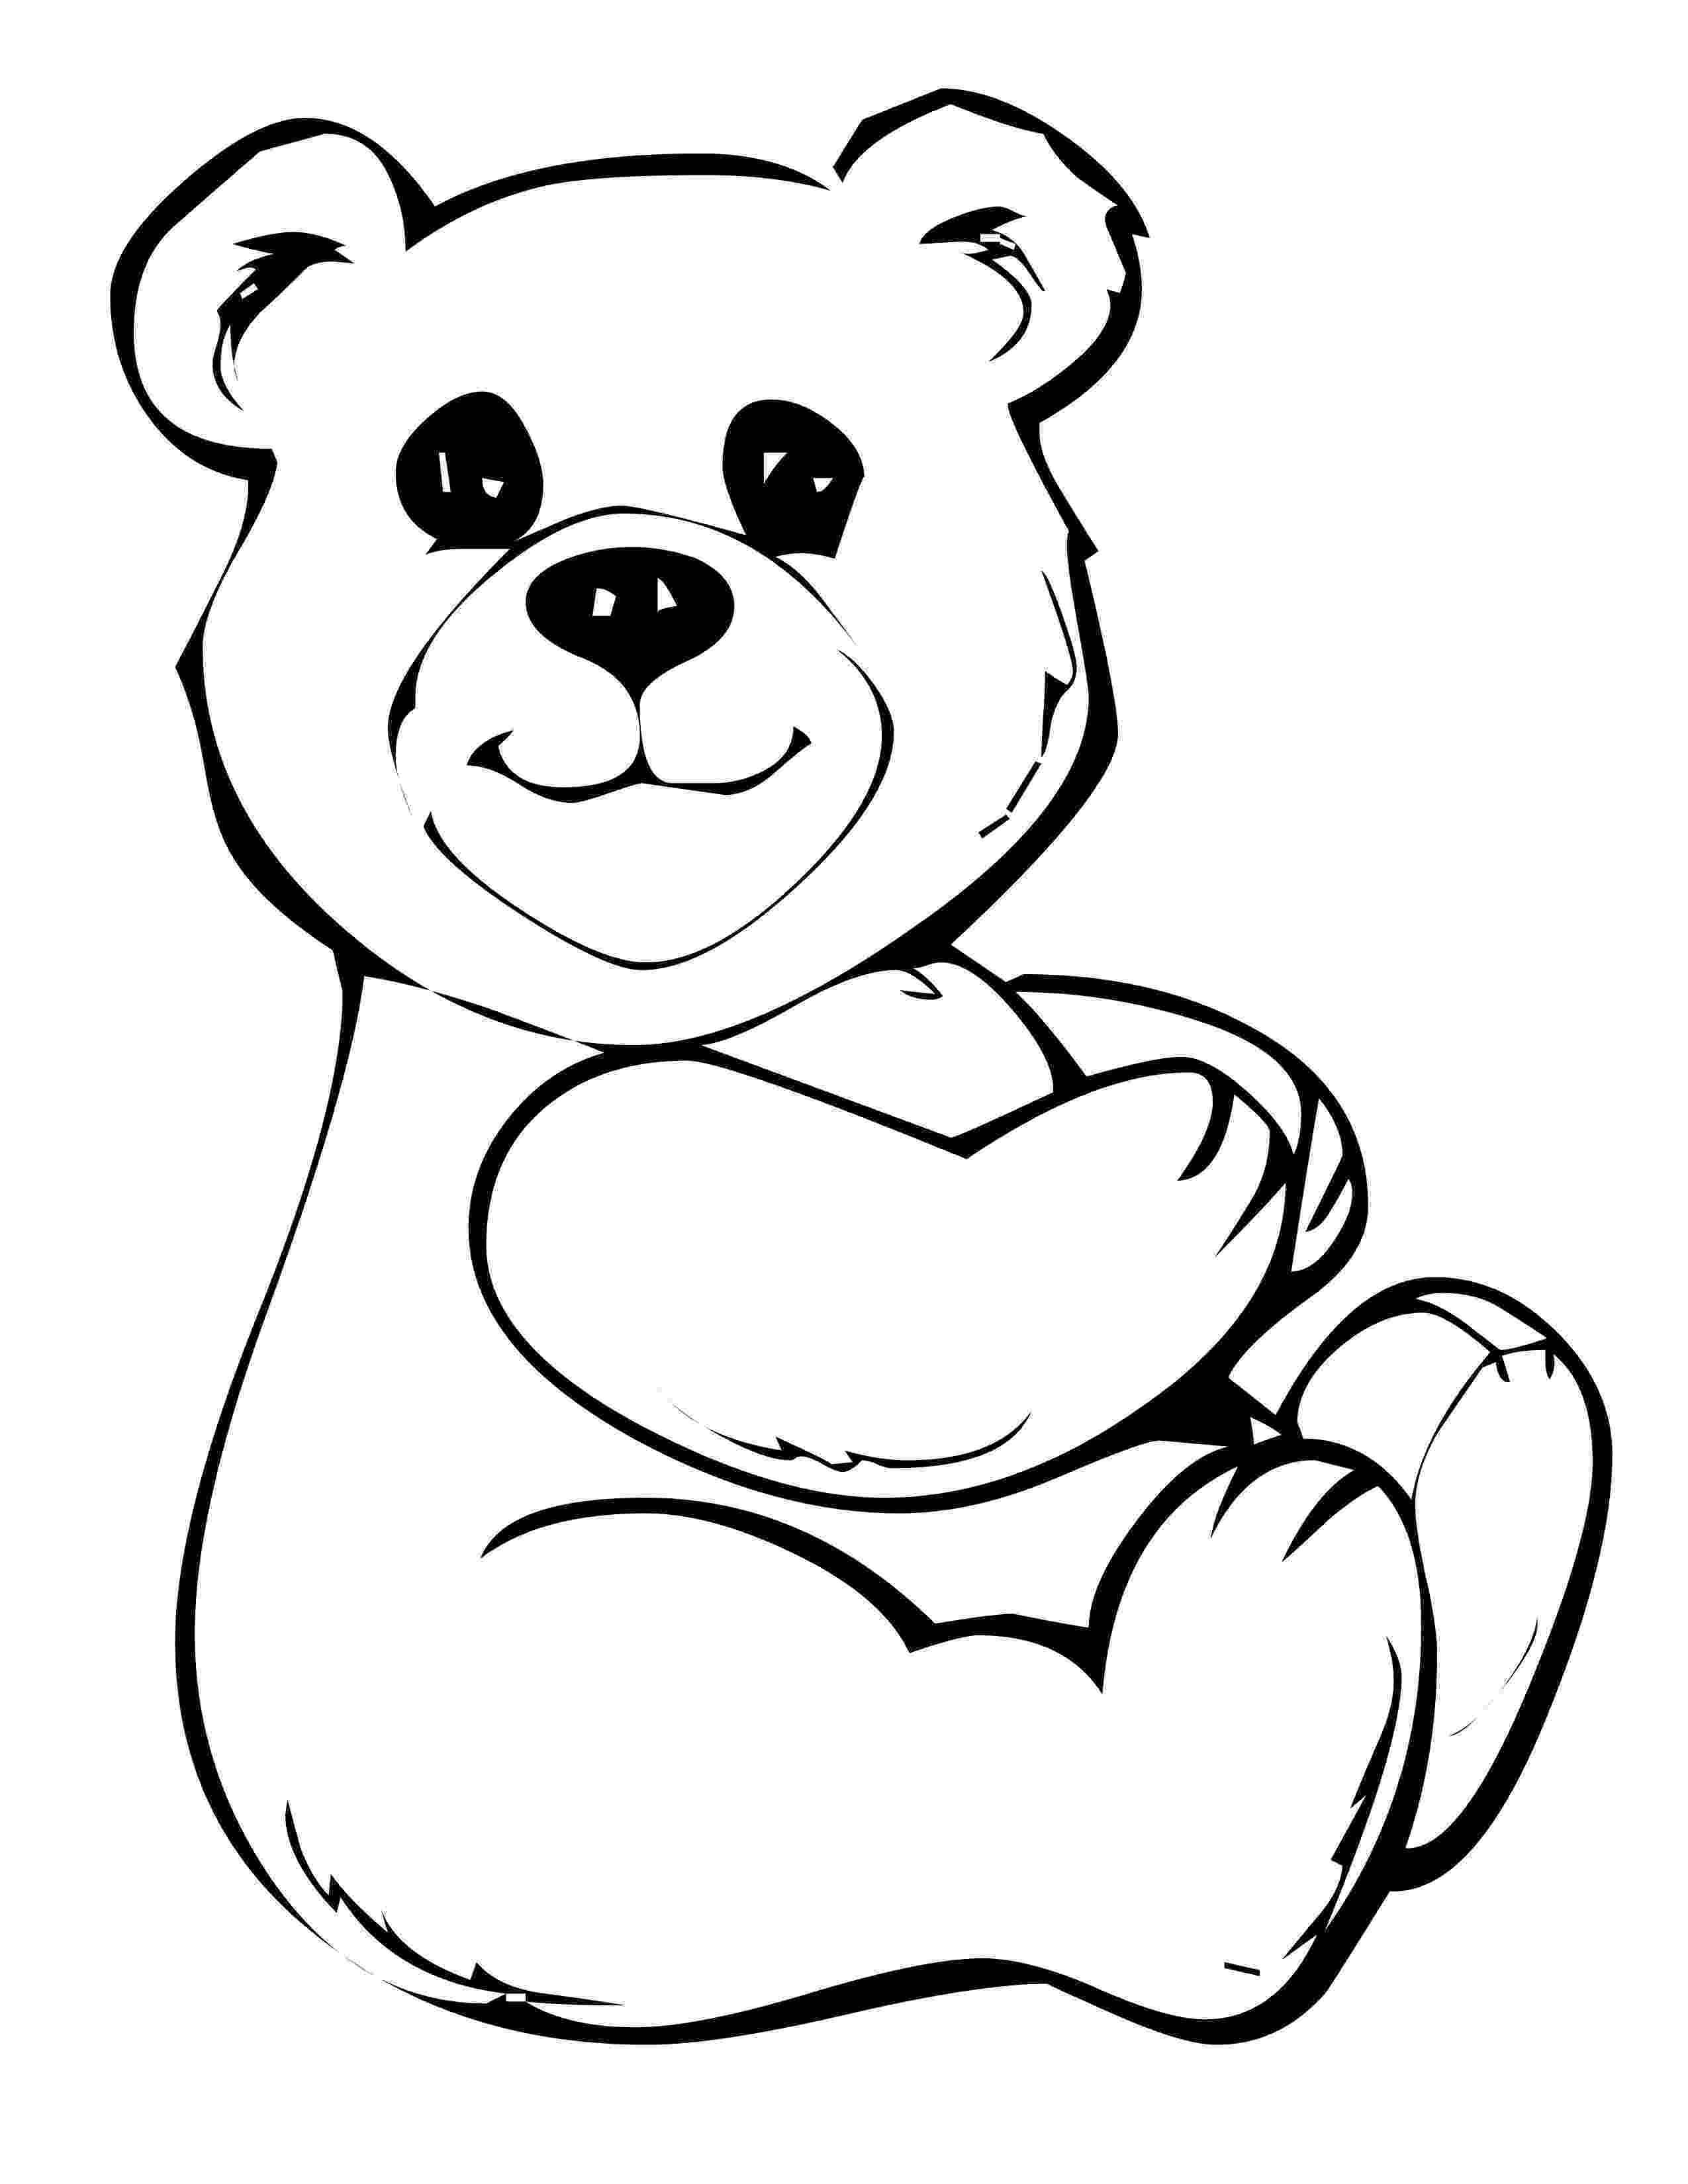 colouring pages of teddy bear teddy bear coloring pages gtgt disney coloring pages of teddy pages colouring bear